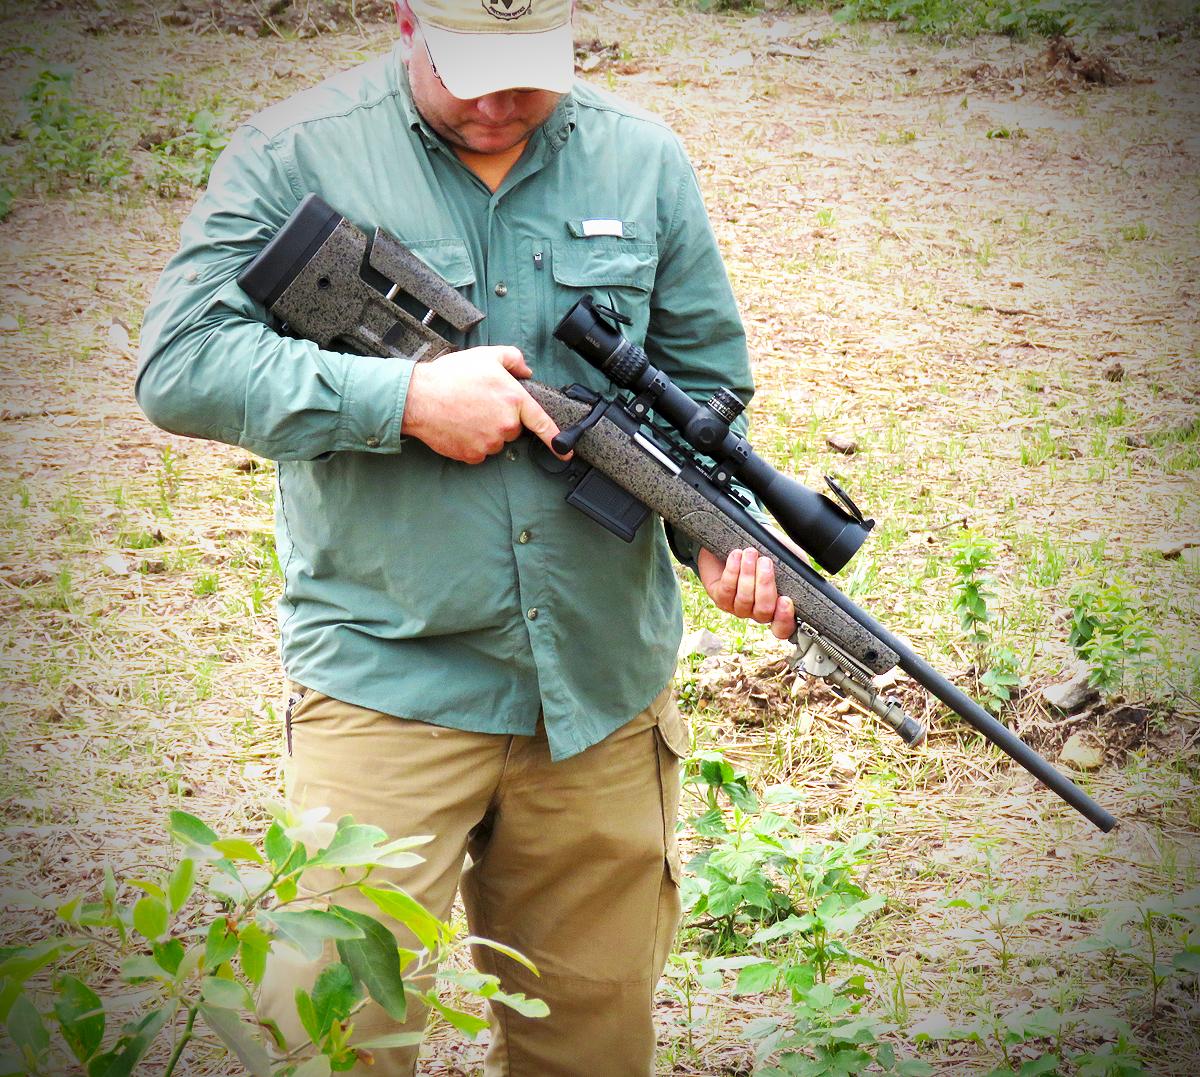 A Hybrid Hunting/Match Rifle? The Bergara 6 5 B-14 HMR